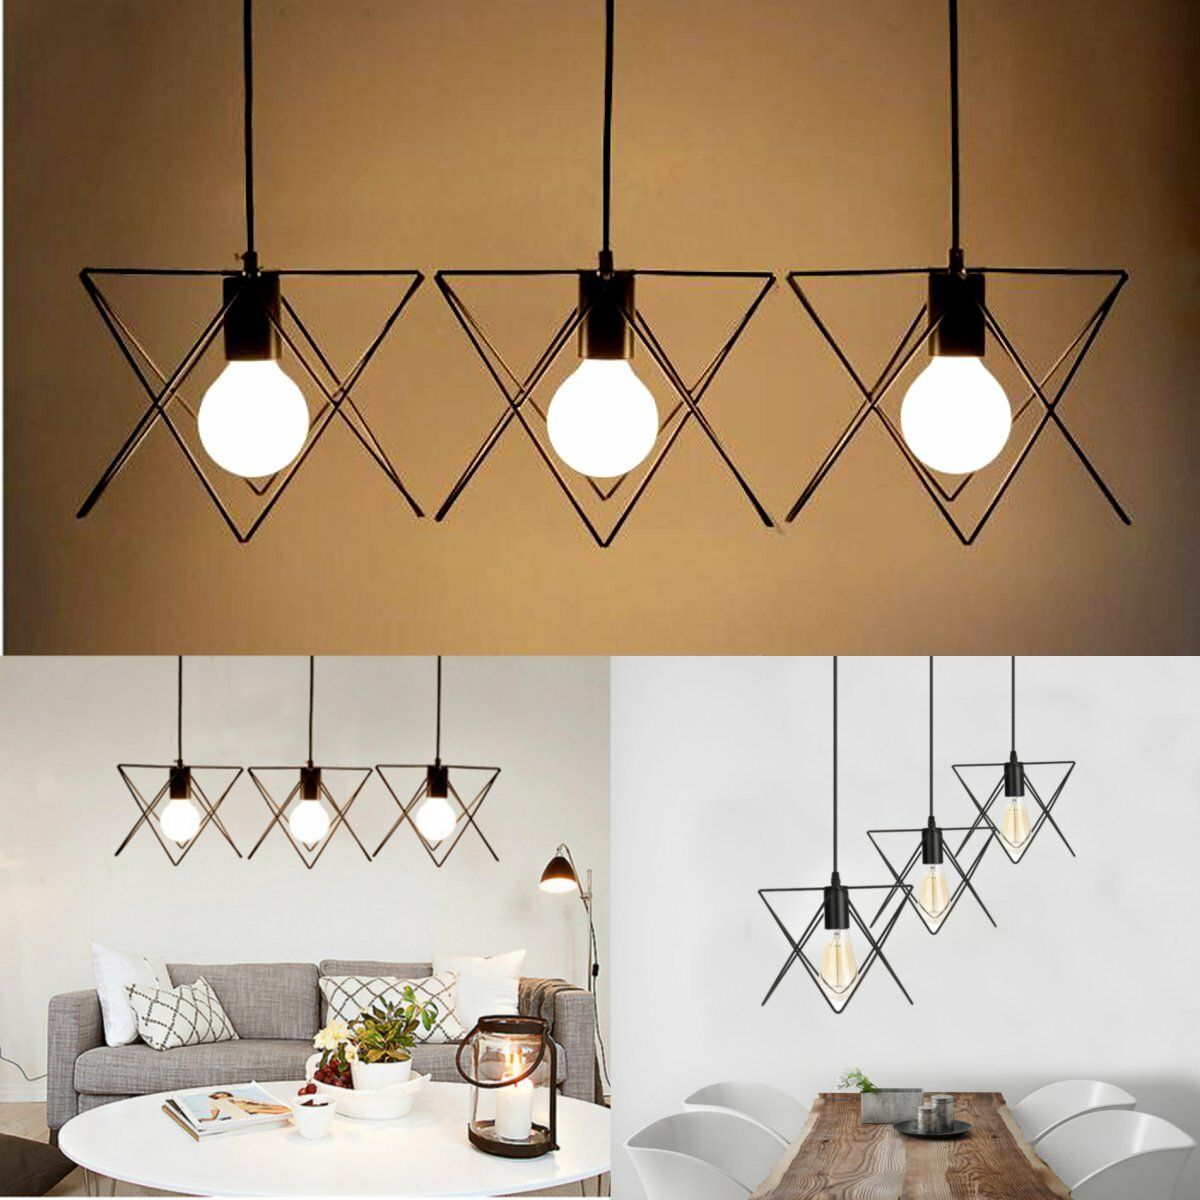 3 In 1 Metall Weinlese Deckenleuchte hängende Lampen Rahmen Lampenschirm Befestigungs Leuchter Innenbeleuchtung